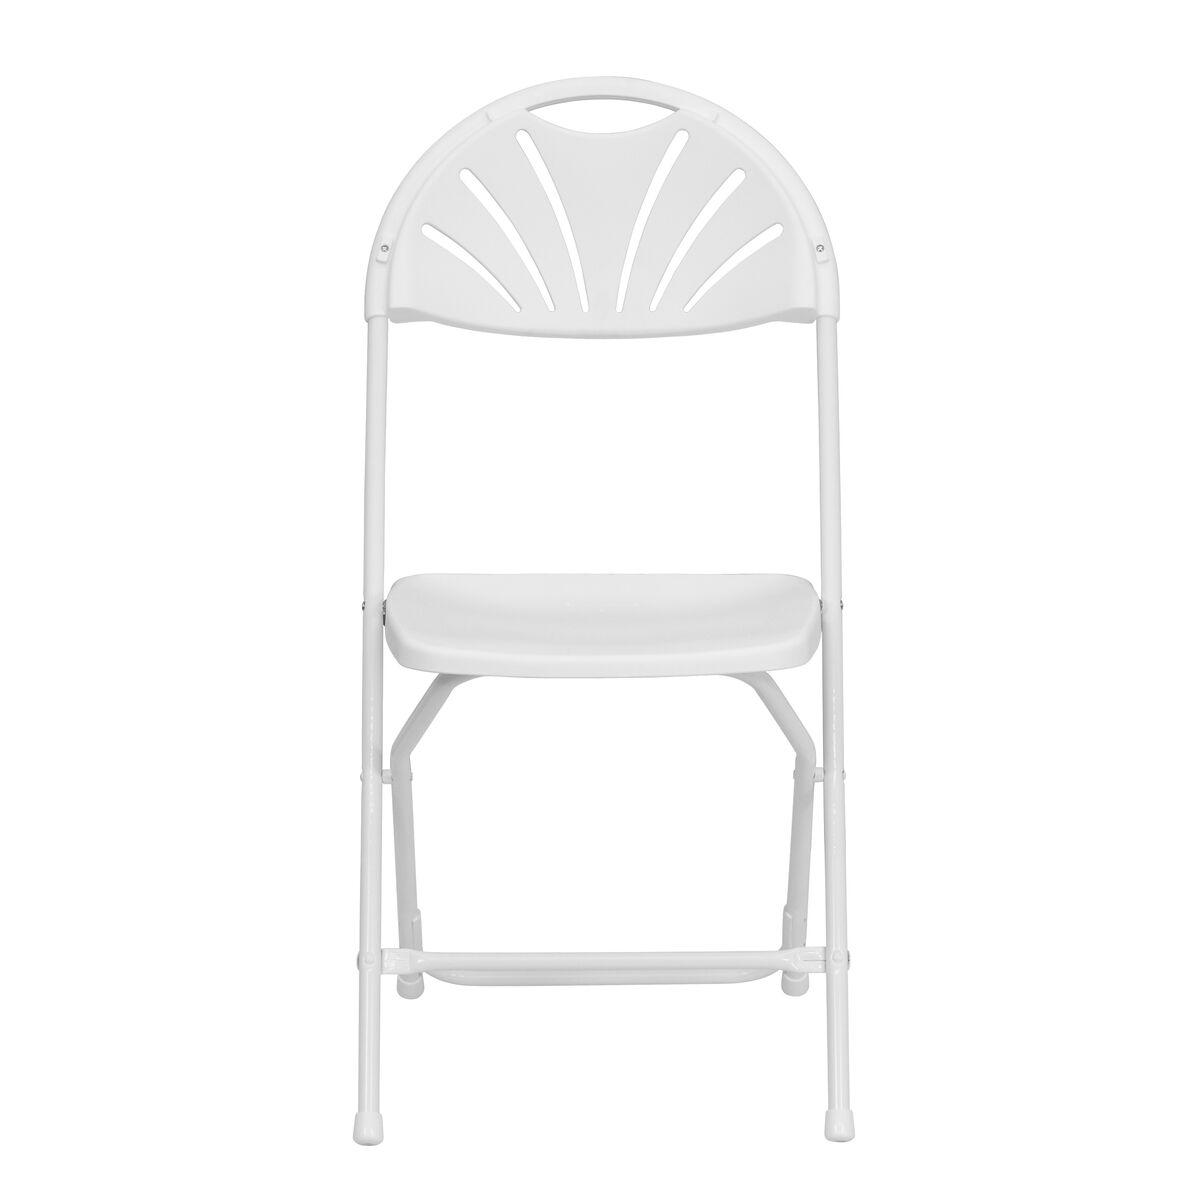 Outstanding Hercules Series 650 Lb Capacity White Plastic Fan Back Folding Chair Ibusinesslaw Wood Chair Design Ideas Ibusinesslaworg